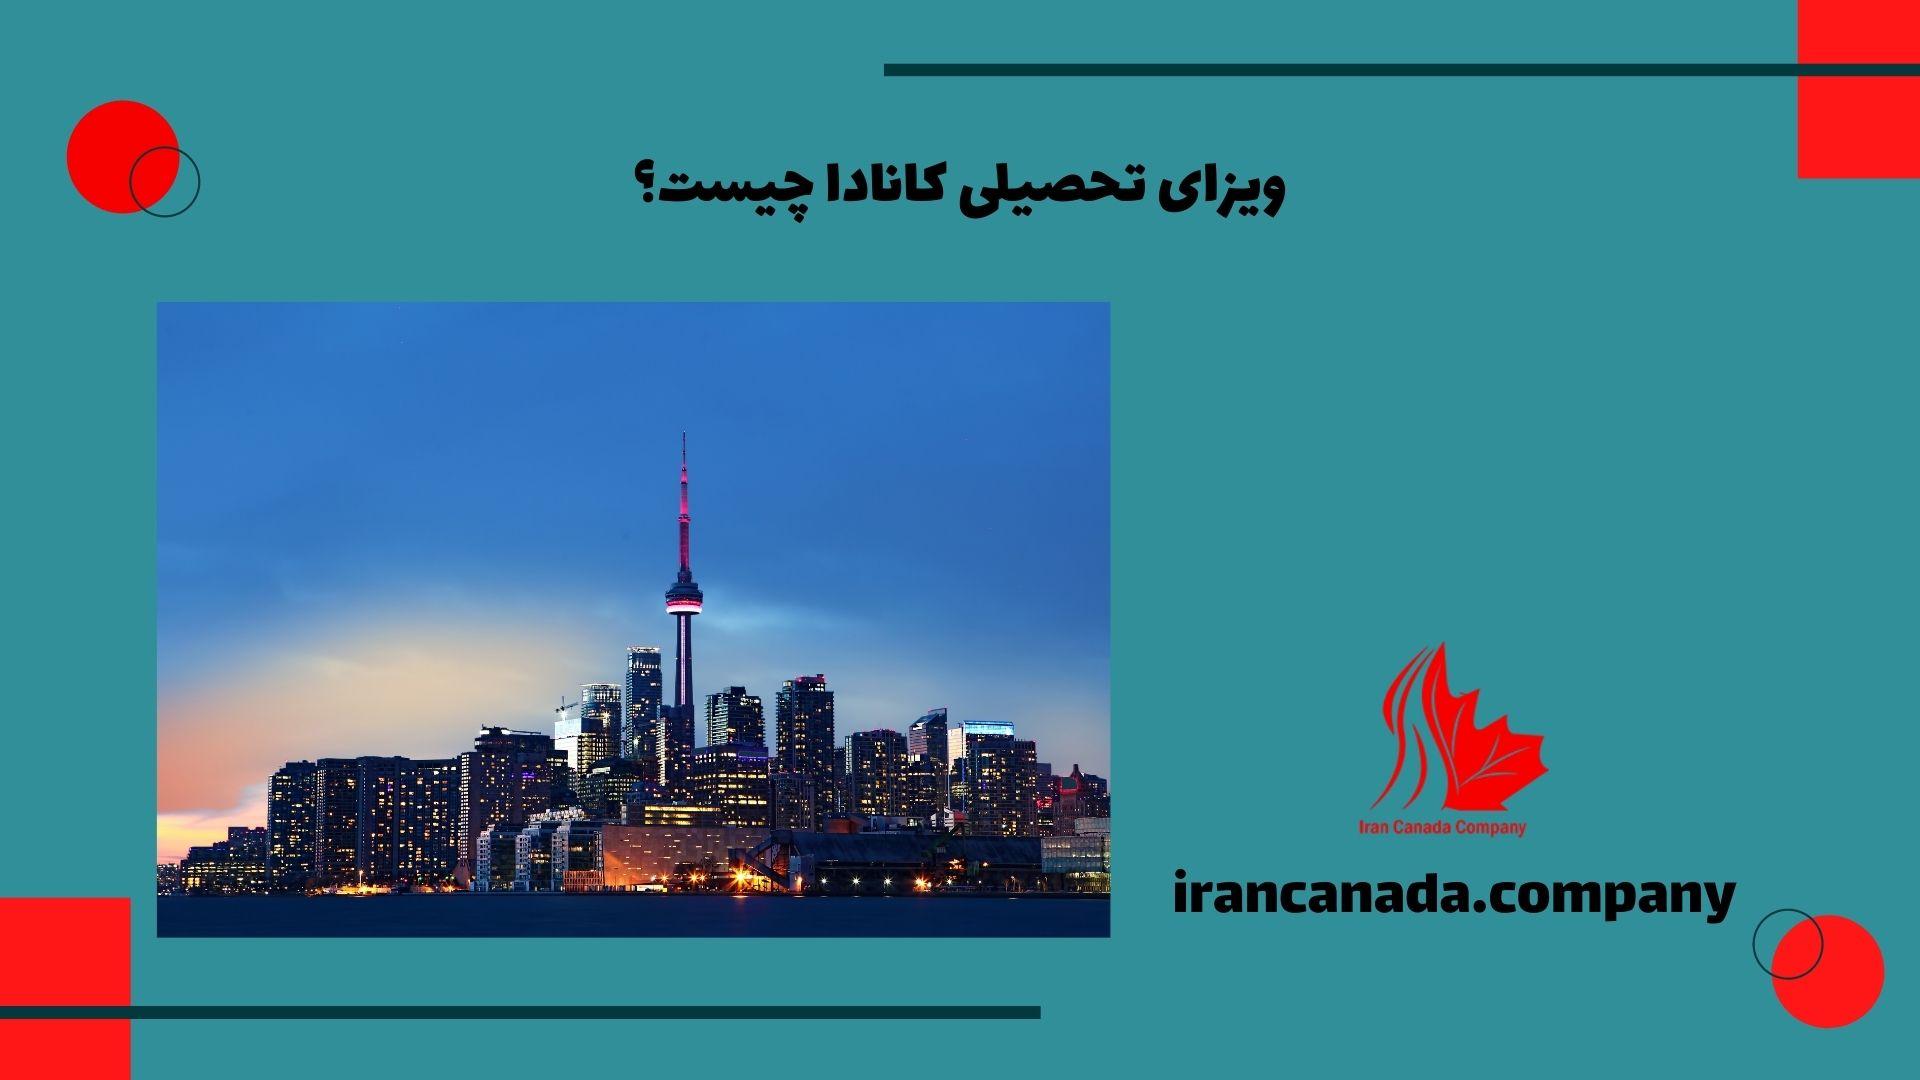 ویزای تحصیلی کانادا چیست؟